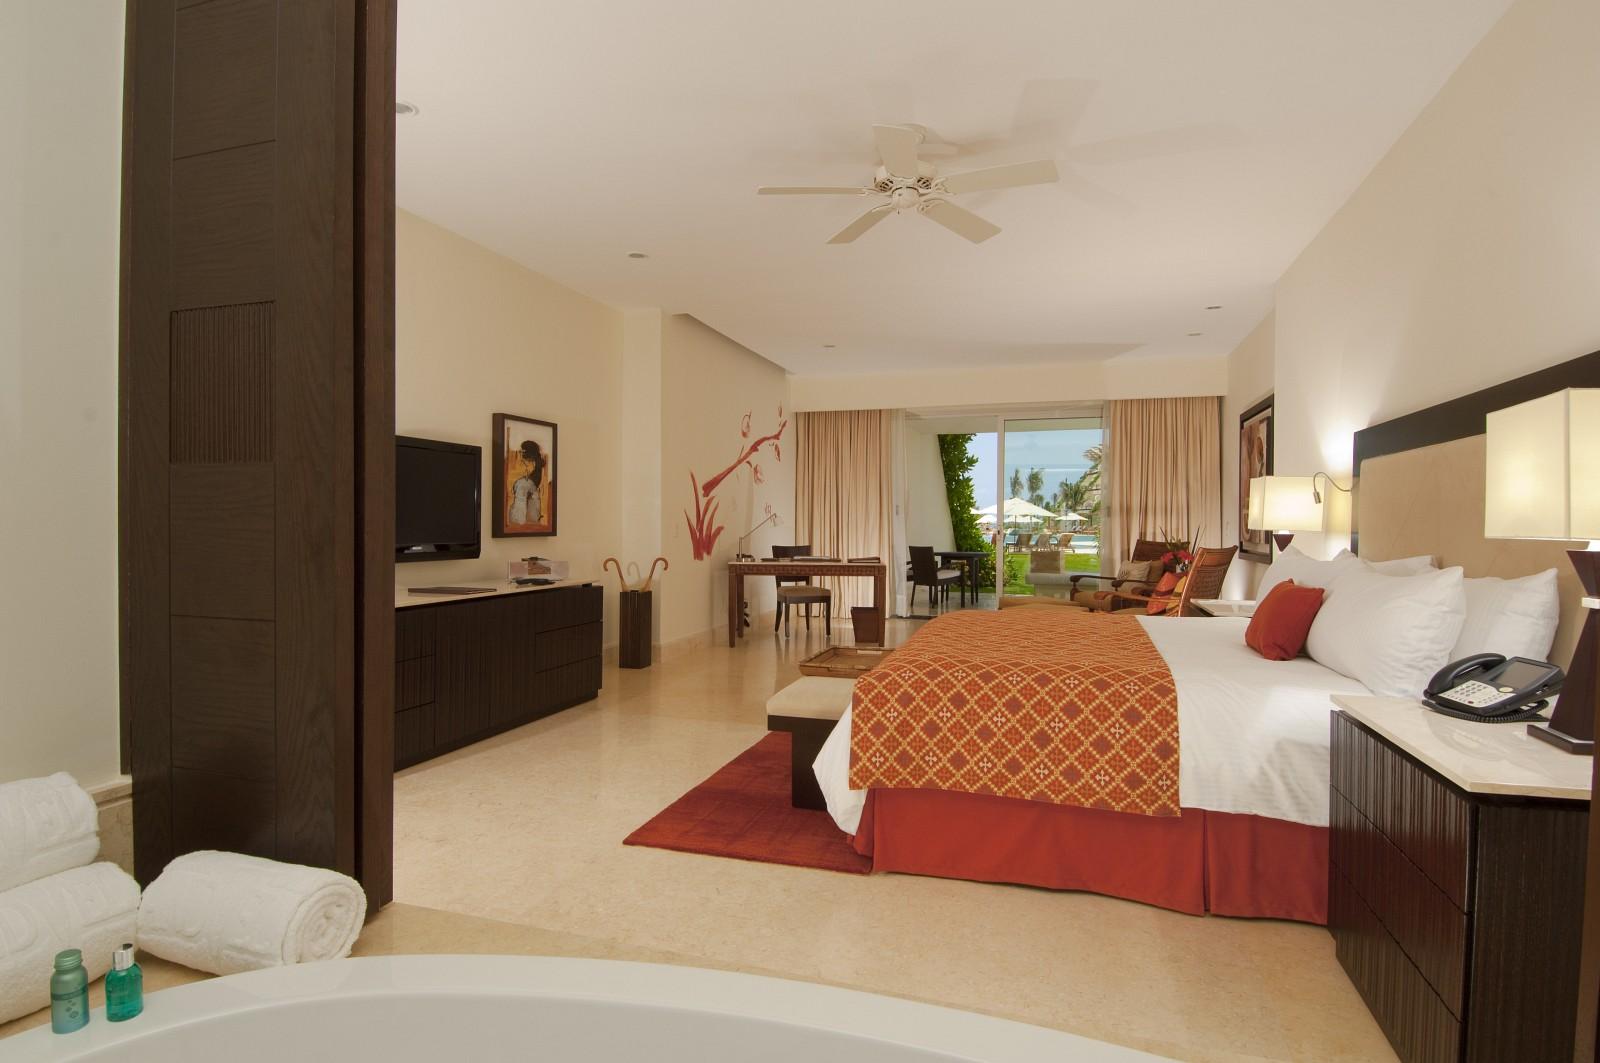 Travel Agency All-Inclusive Resort Grand Velas Riviera Maya 028